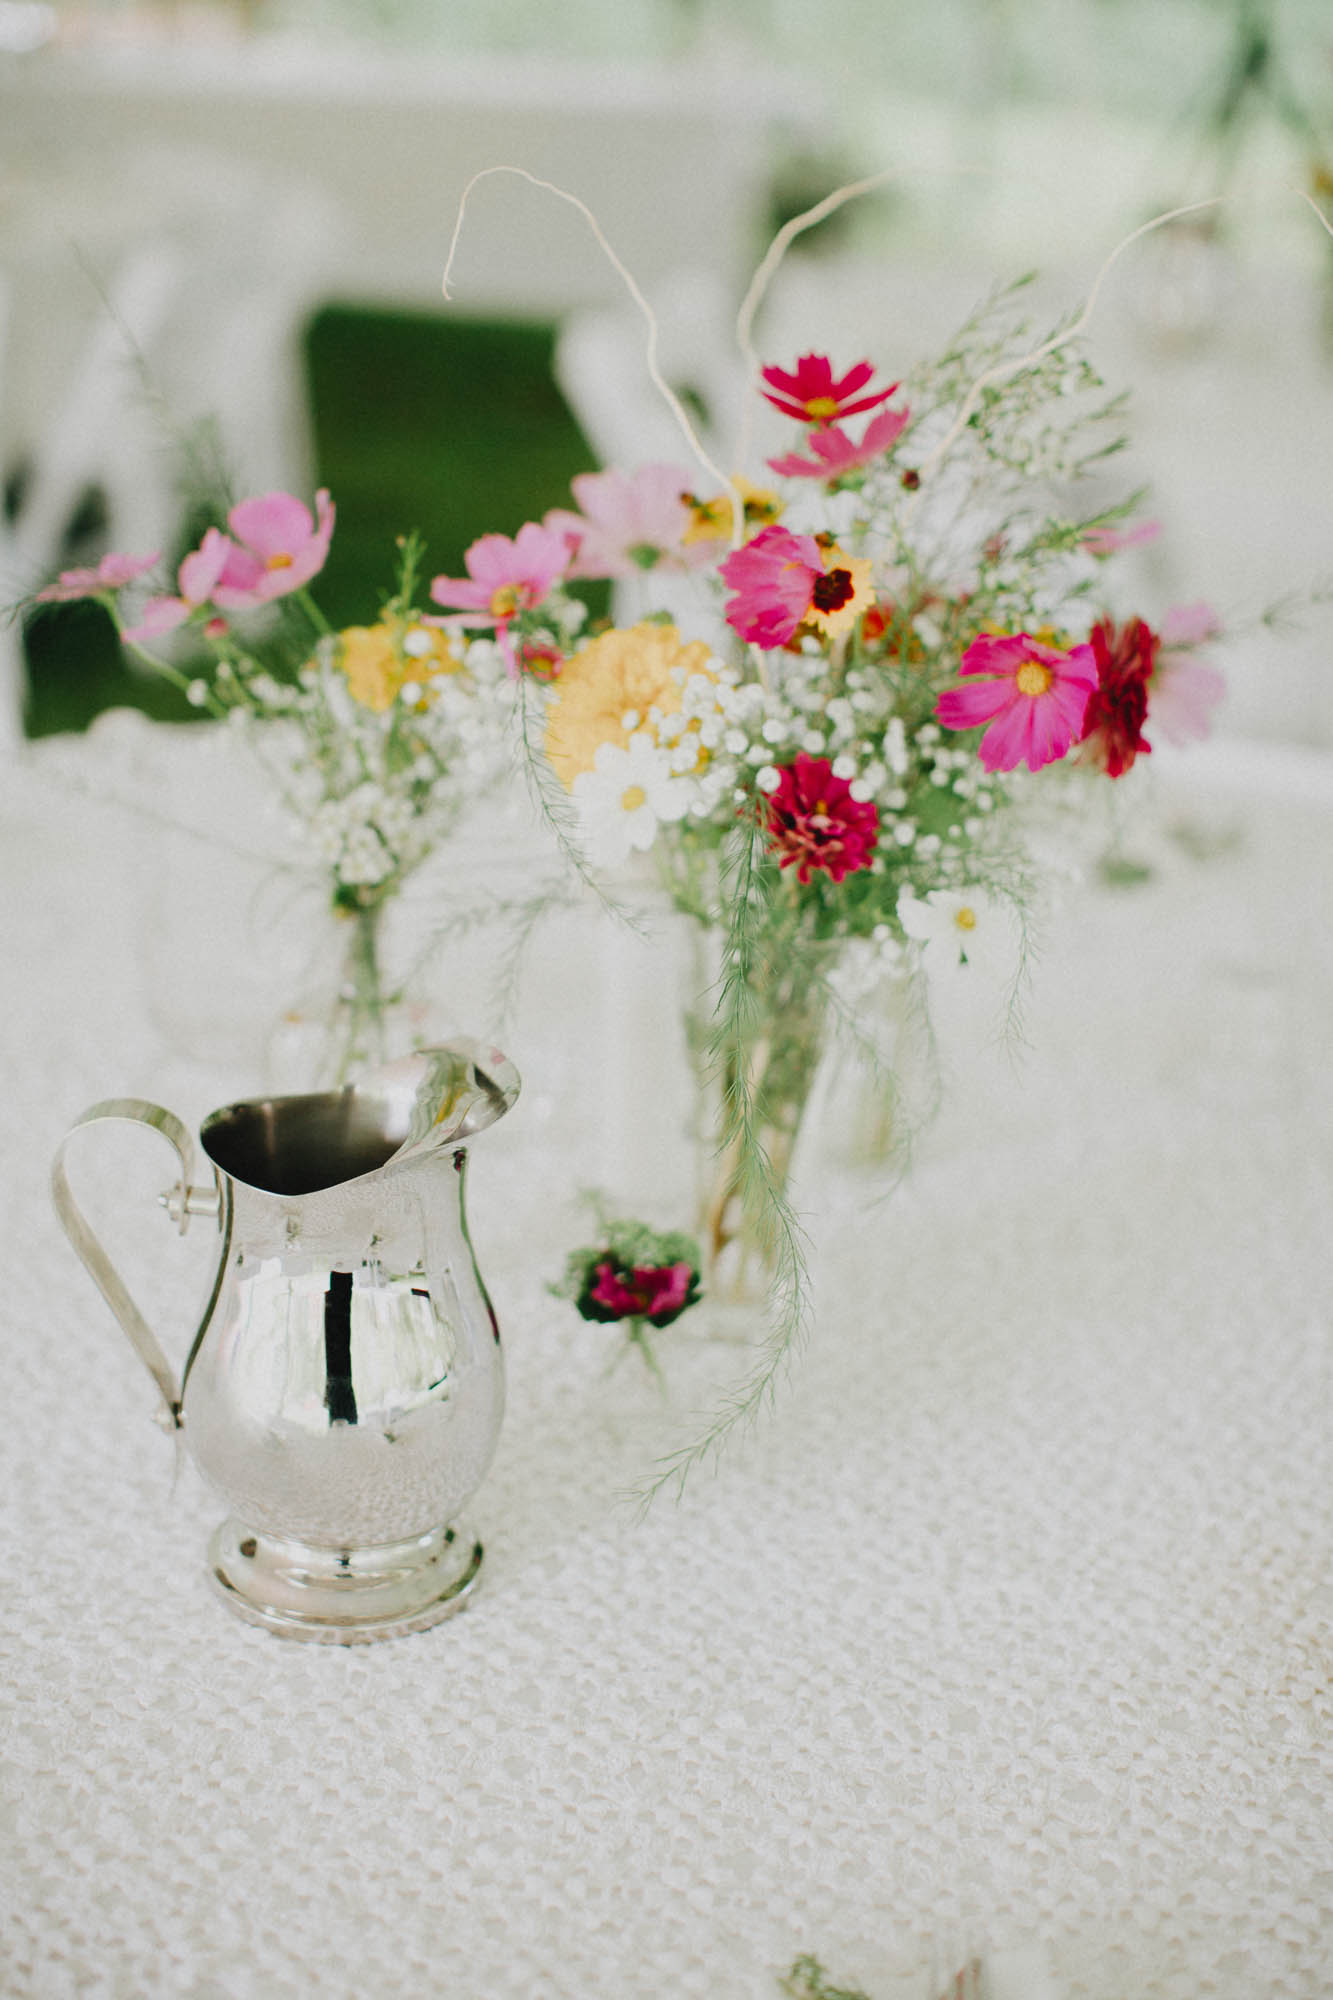 Leah-Graham-Outdoor-DIY-Michigan-Wedding-Details-010@2x.jpg